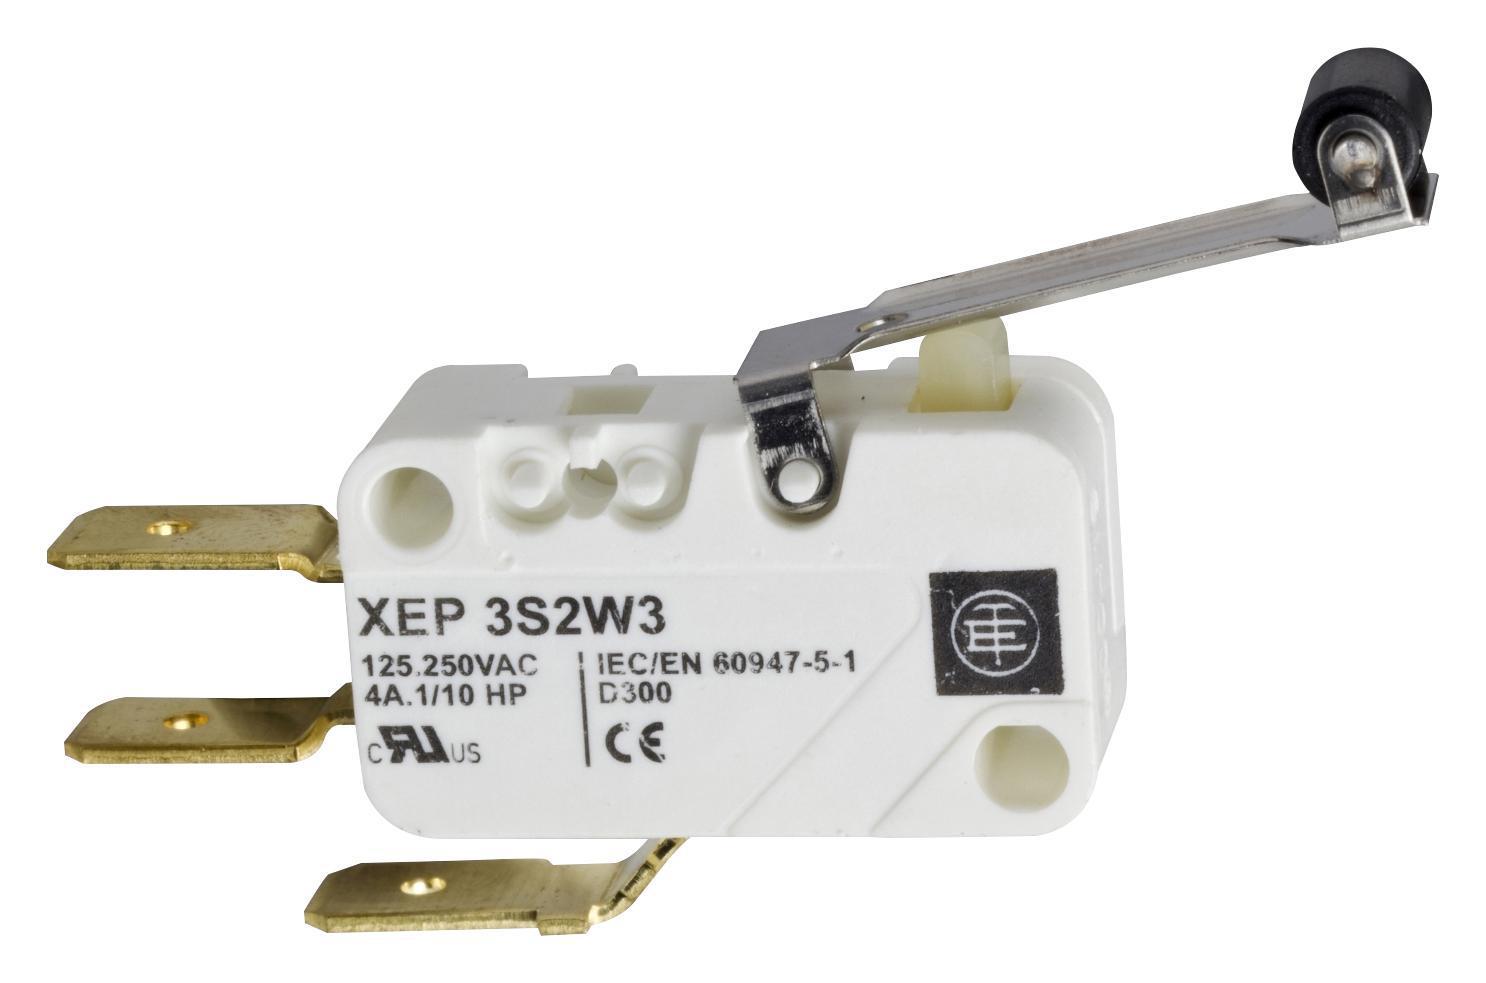 XEP3S2W3B529